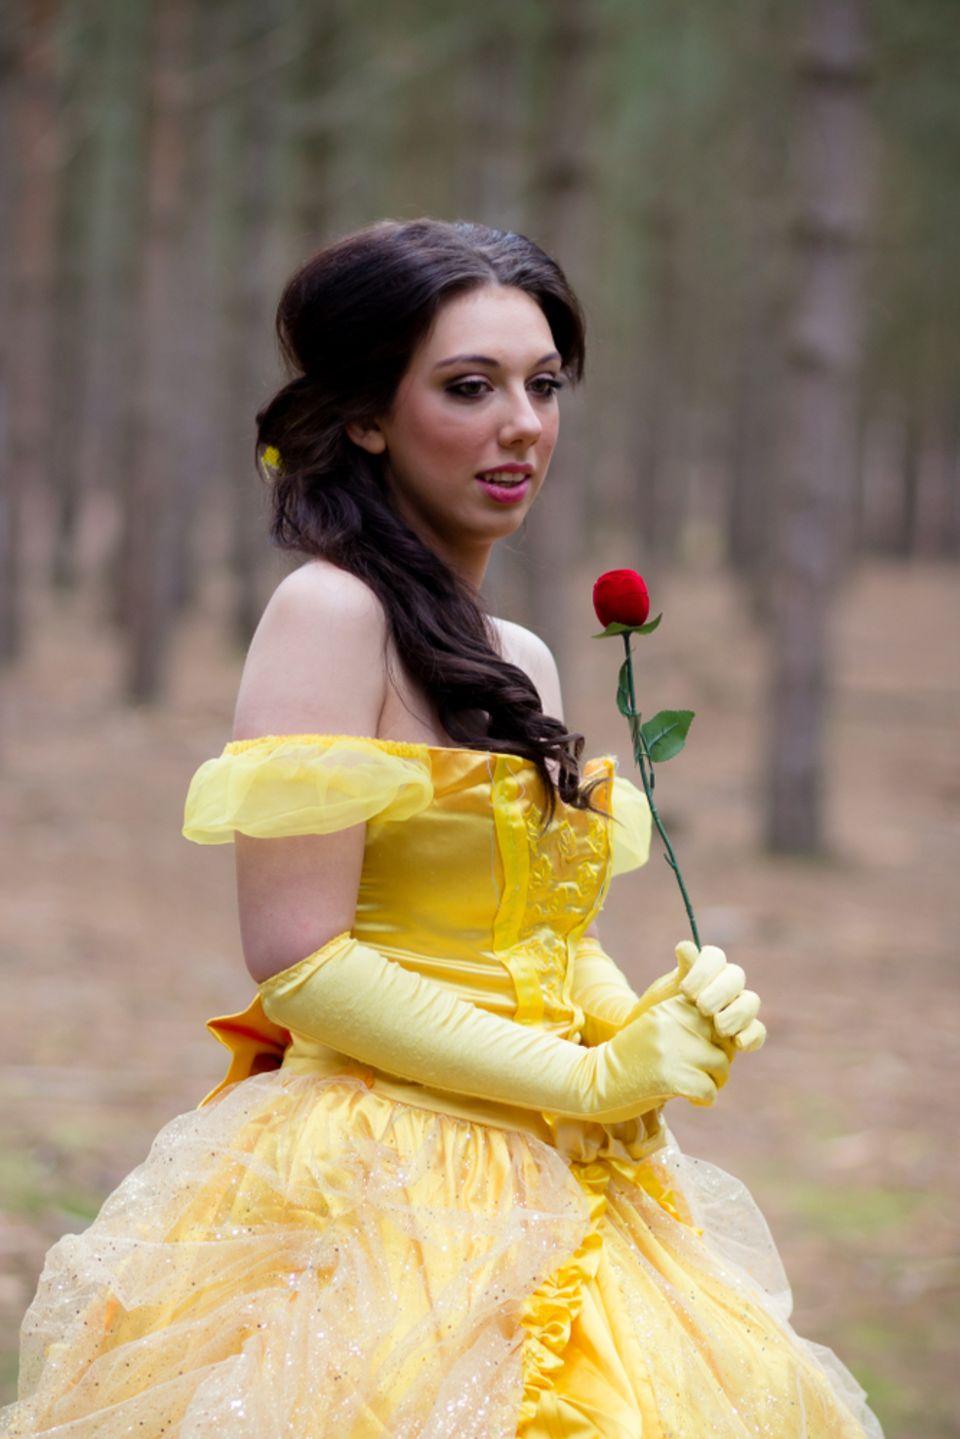 Kindheitshelden: Frau als Belle verkleidet